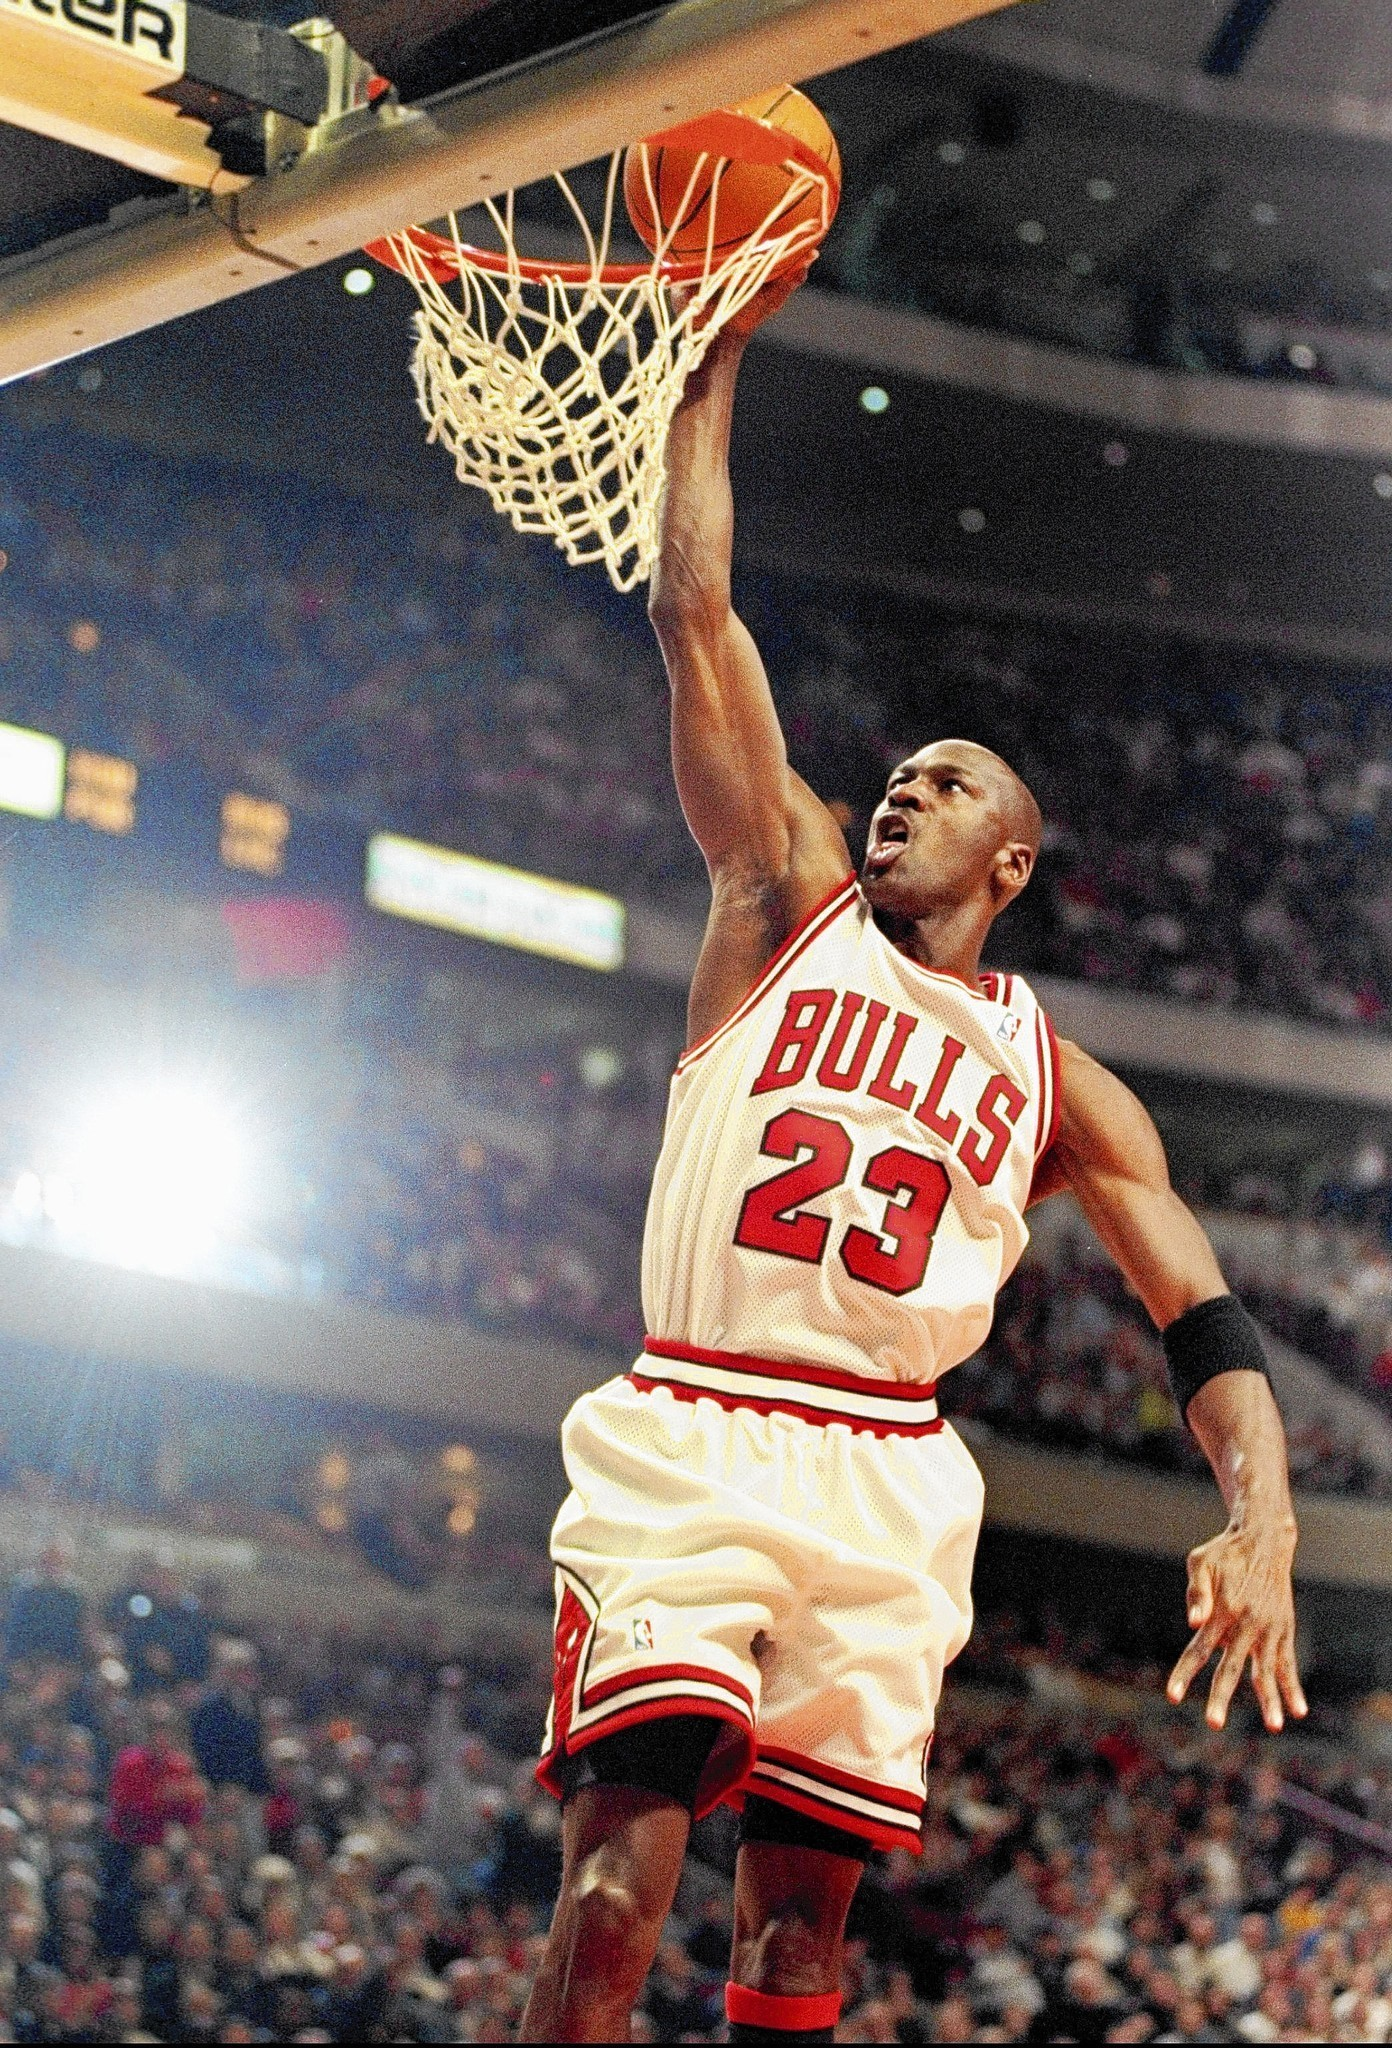 896c587b8a9 Review - 'Michael Jordan: The Life' by Roland Lazenby - Chicago Tribune